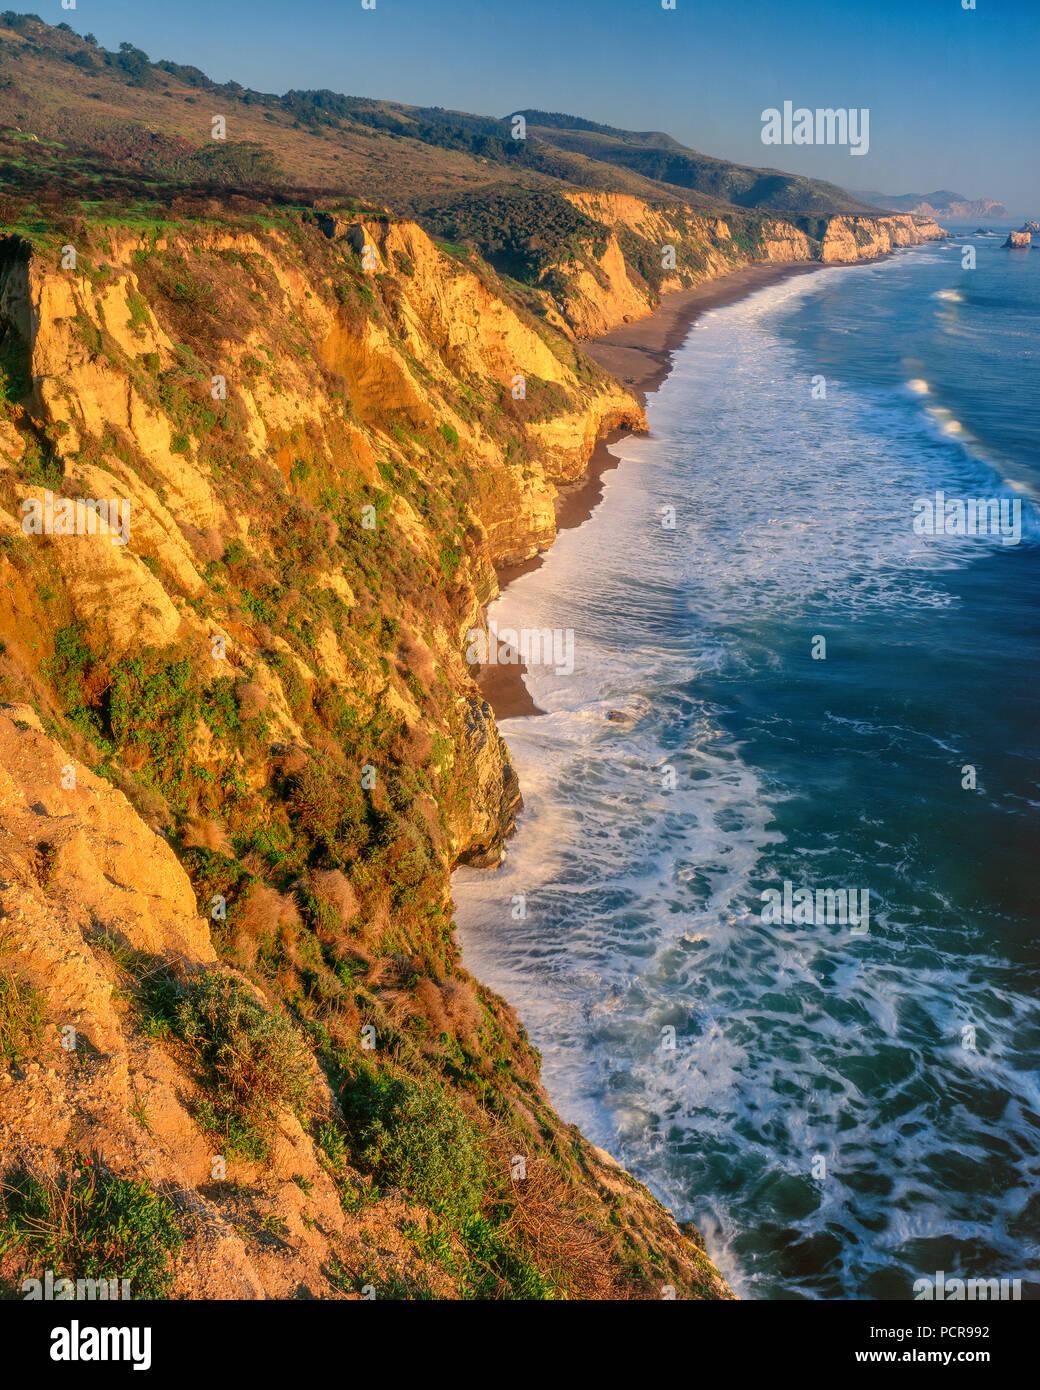 Kelham Beach, Point Reyes National Seashore, Burton deserto, Marin County, California Immagini Stock